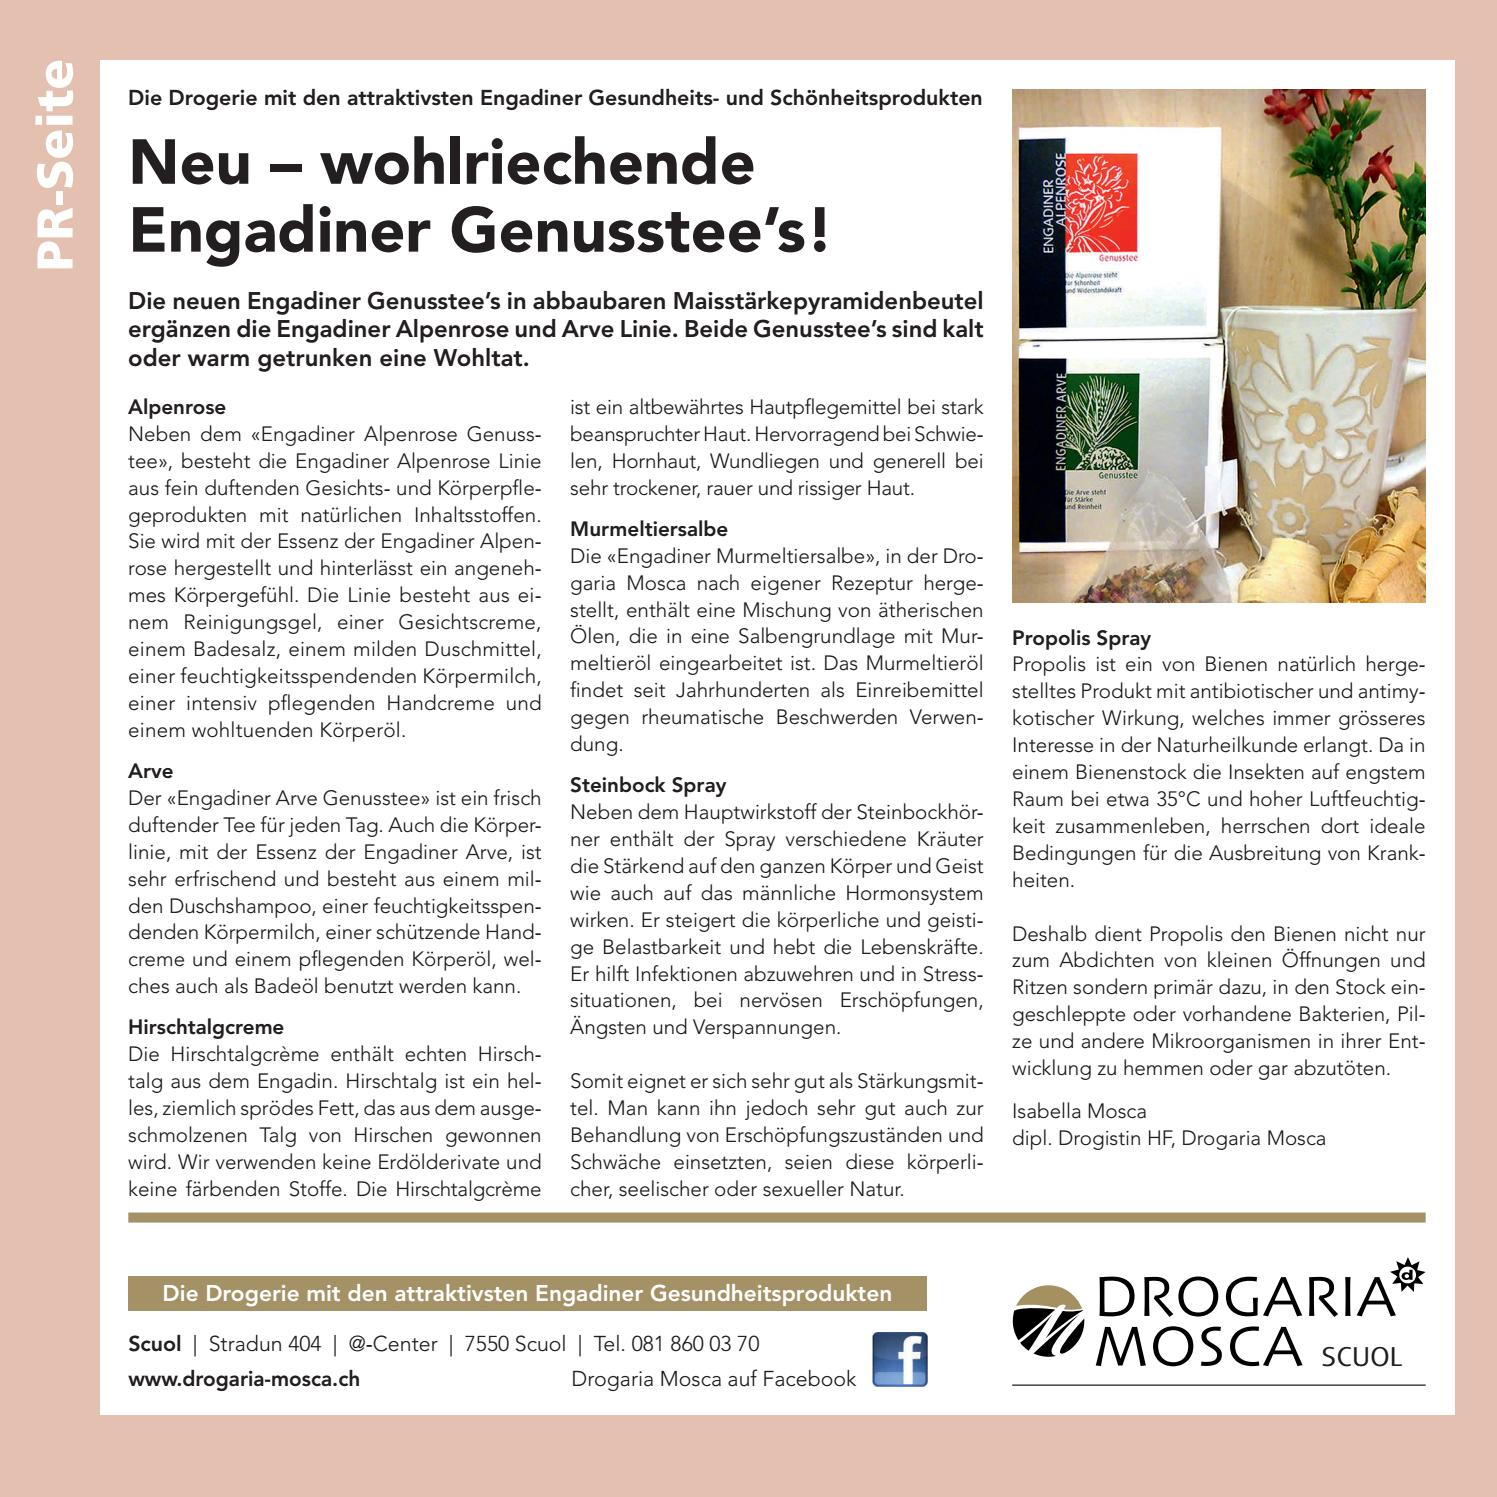 Allegra Nr. 5 by Tourismus Engadin Scuol Samnaun Val Müstair AG - issuu